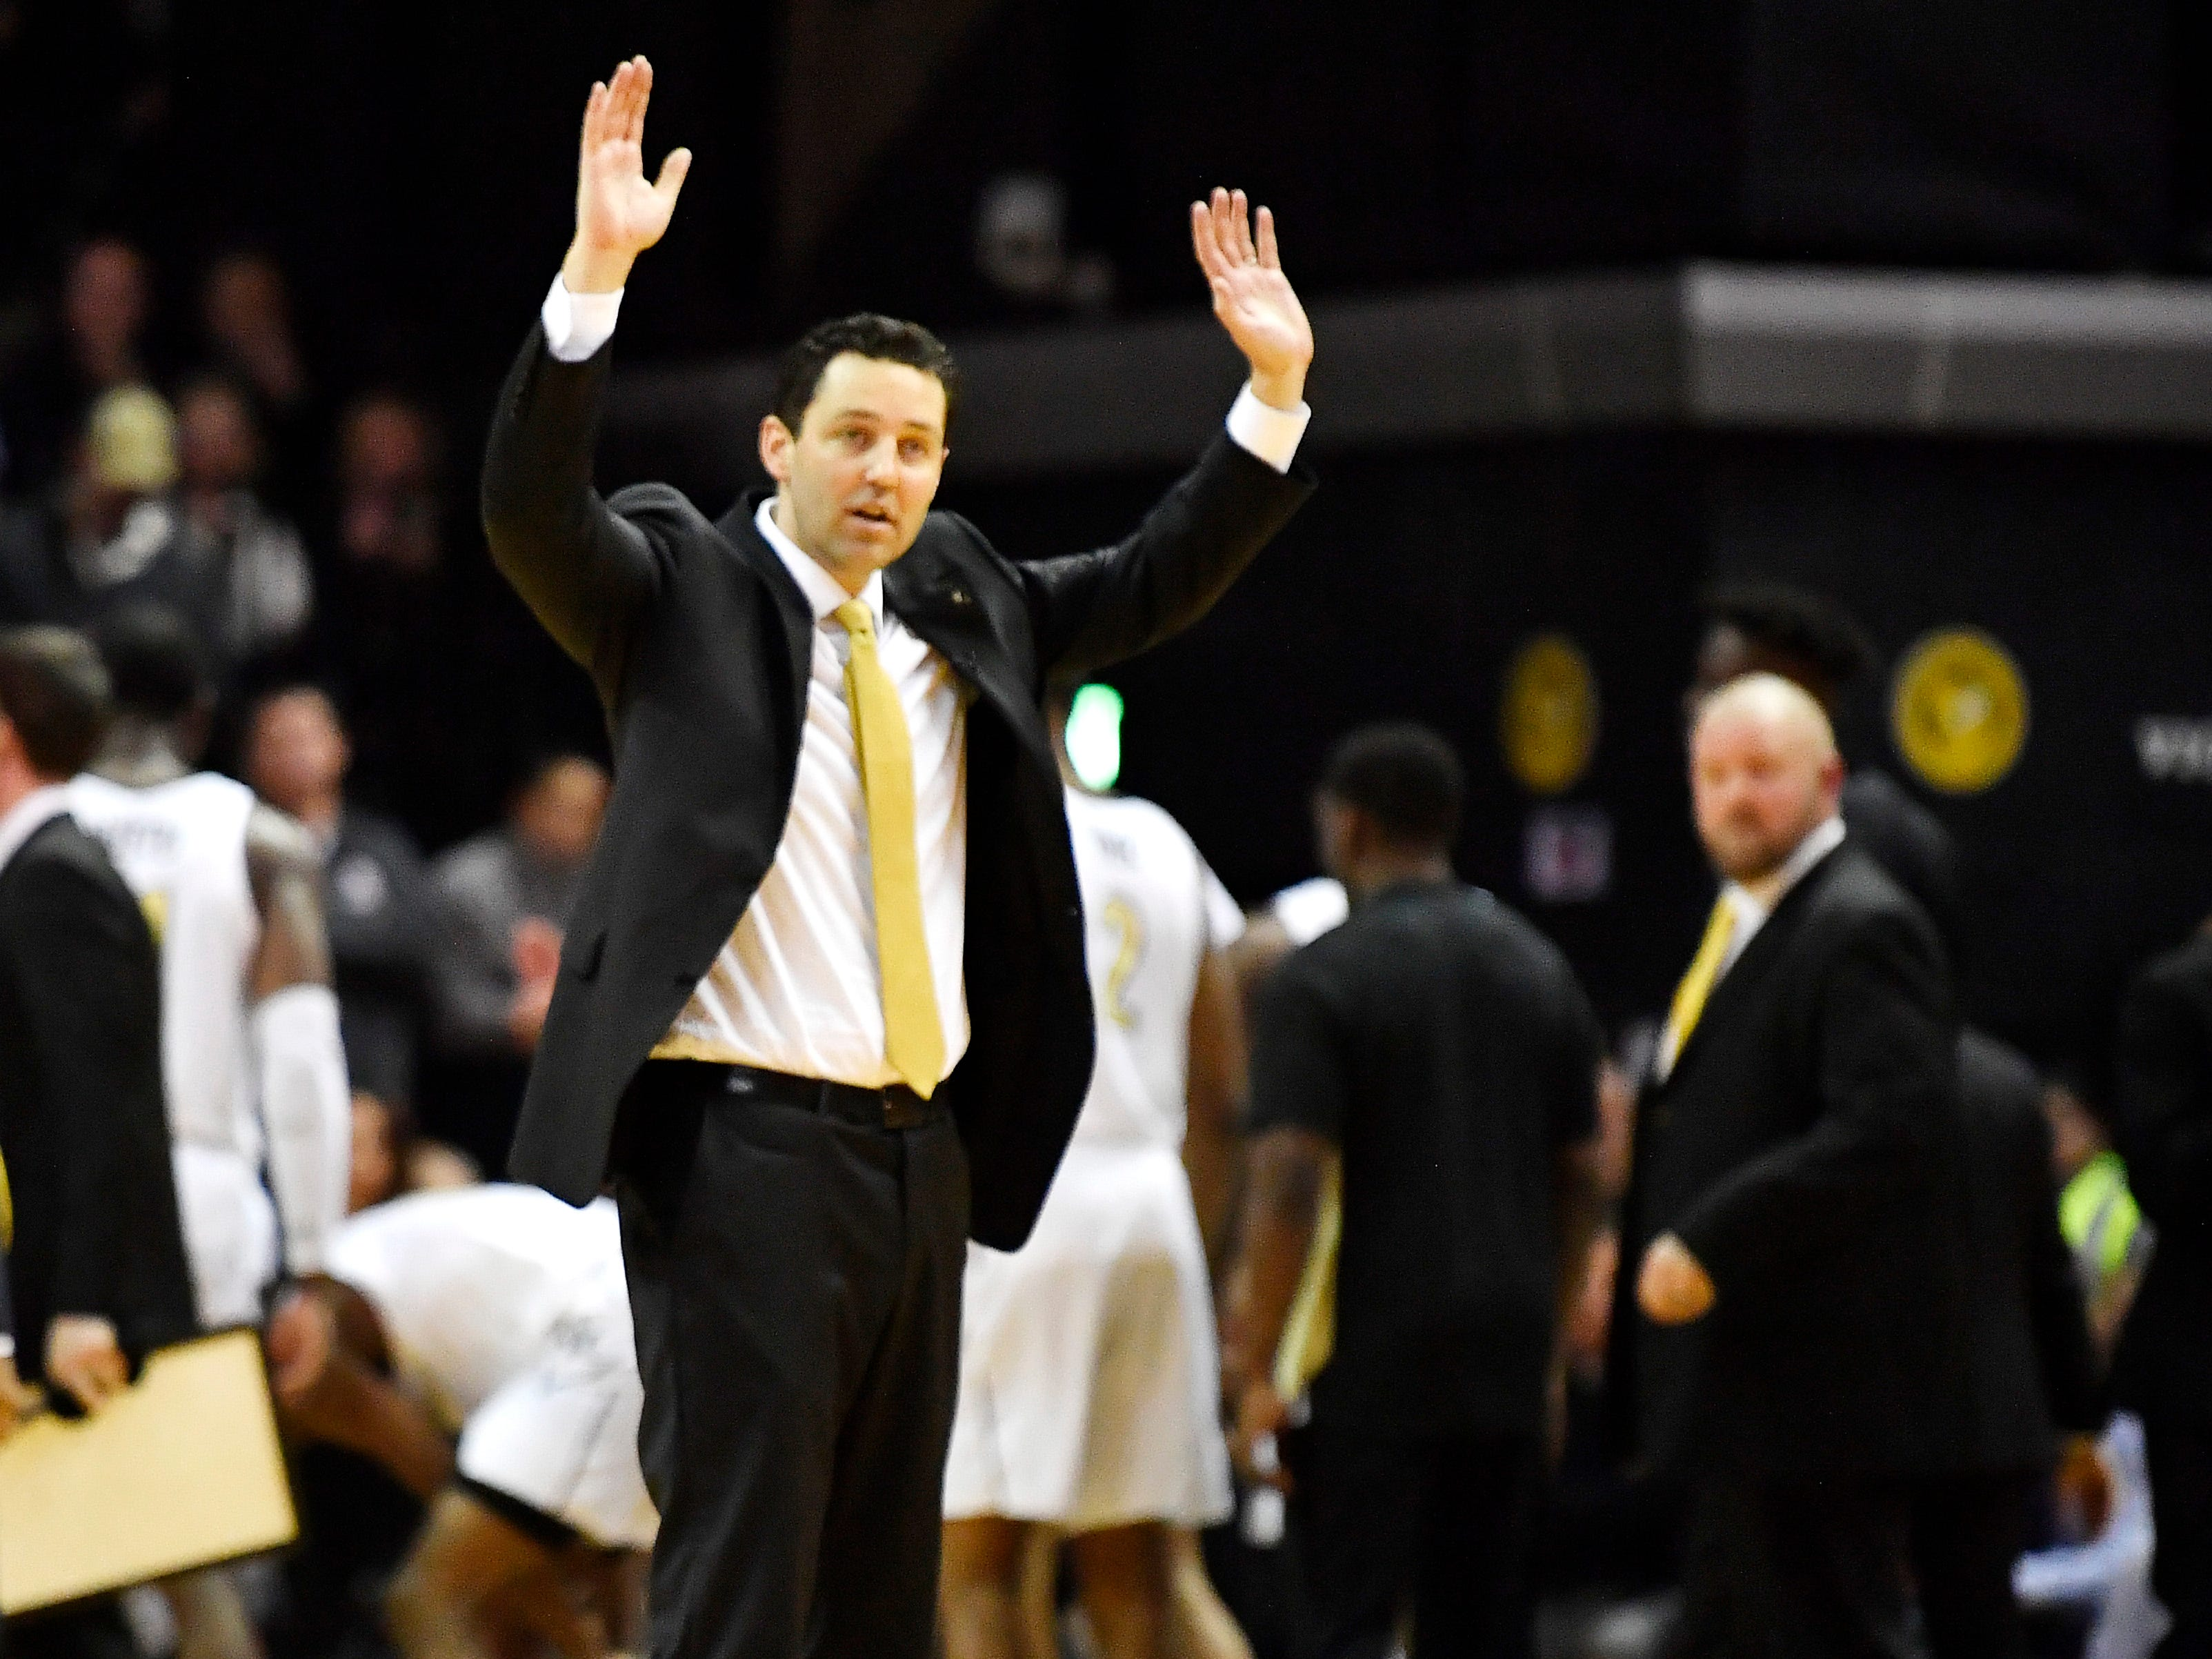 Vanderbilt head coach Bryce Drew argues a call during the second half at Memorial Gym in Nashville, Tenn., Wednesday, Jan. 23, 2019.